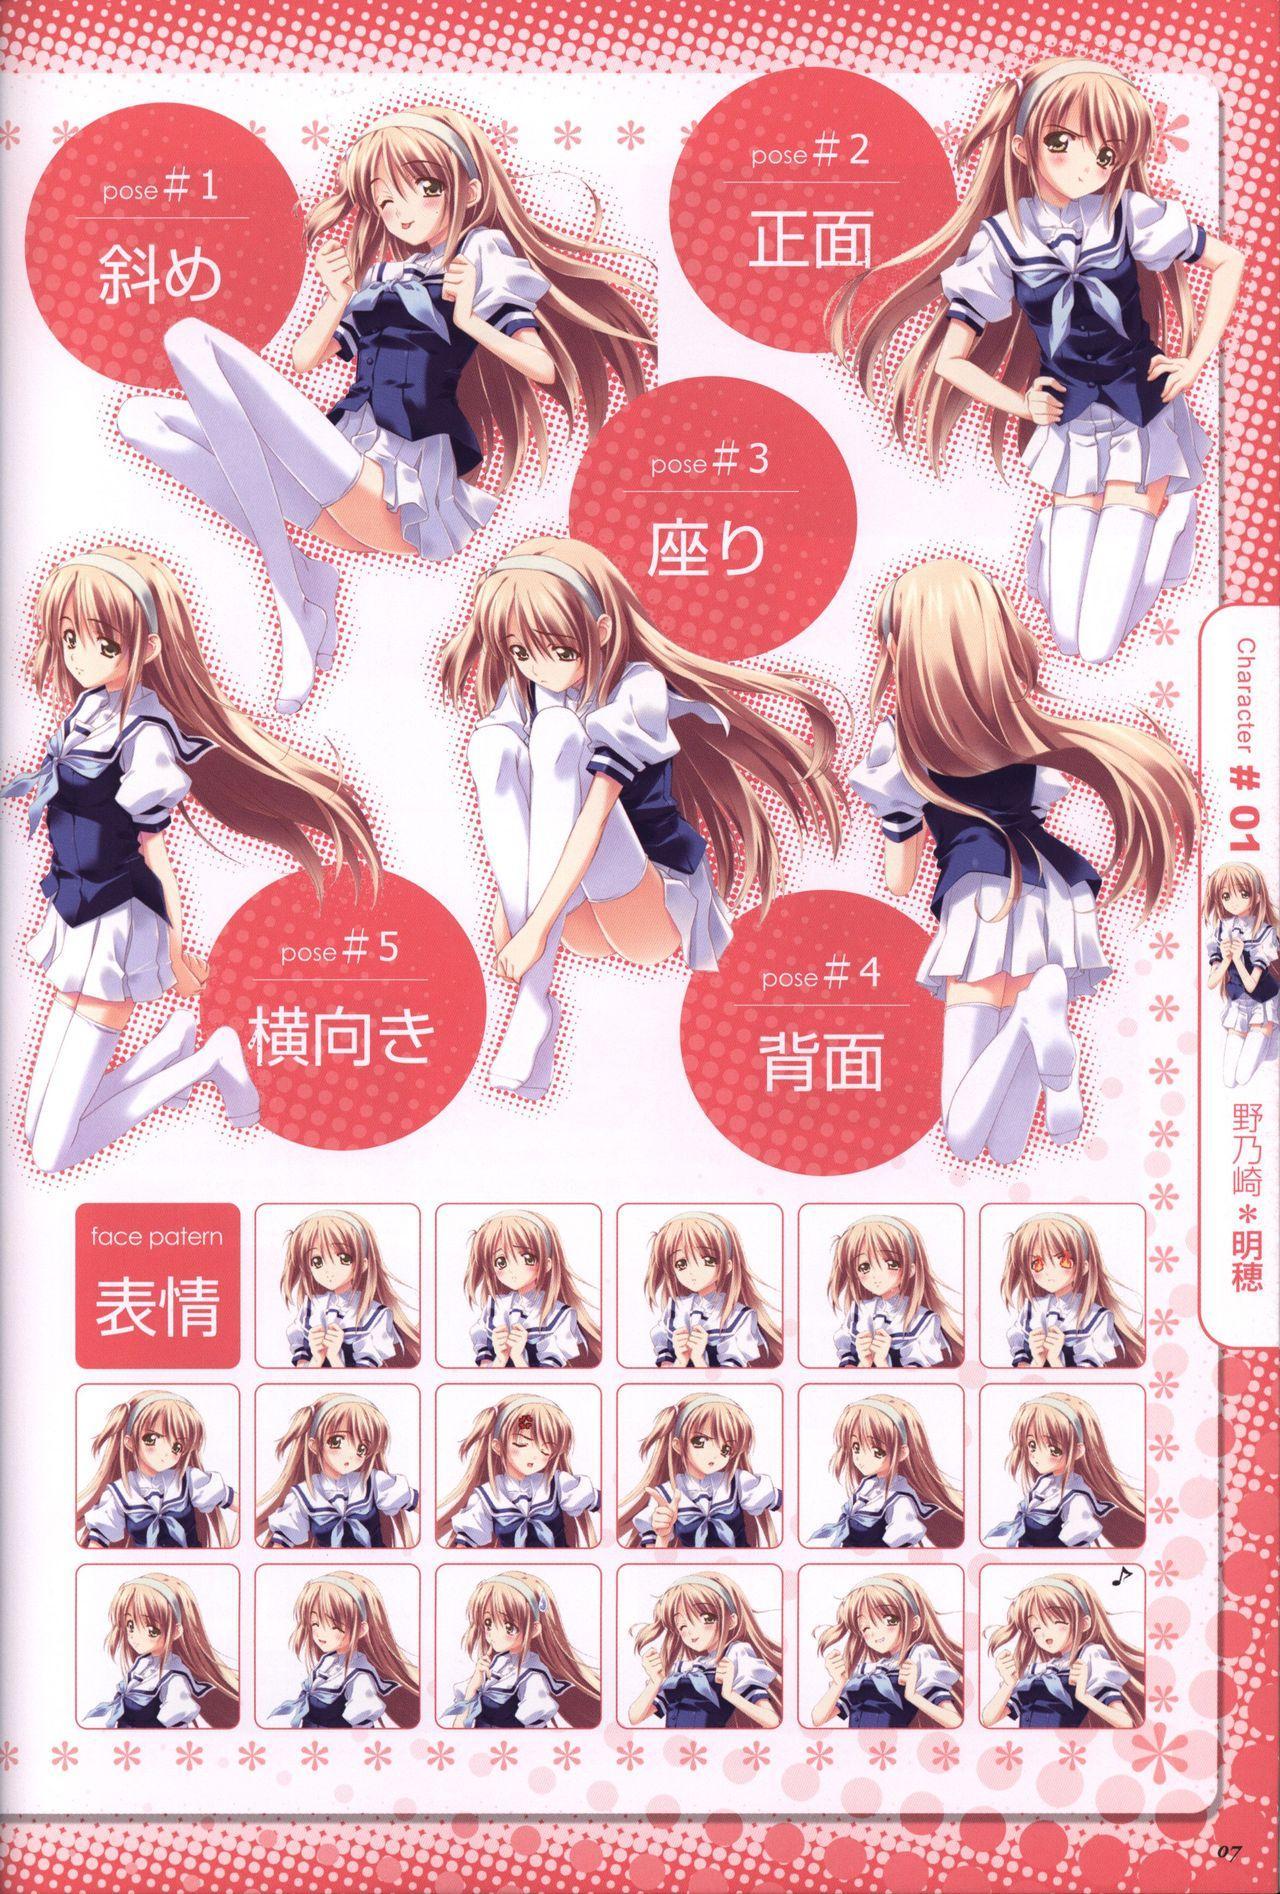 Moshimo Ashita ga Harenaraba official fanbook 7